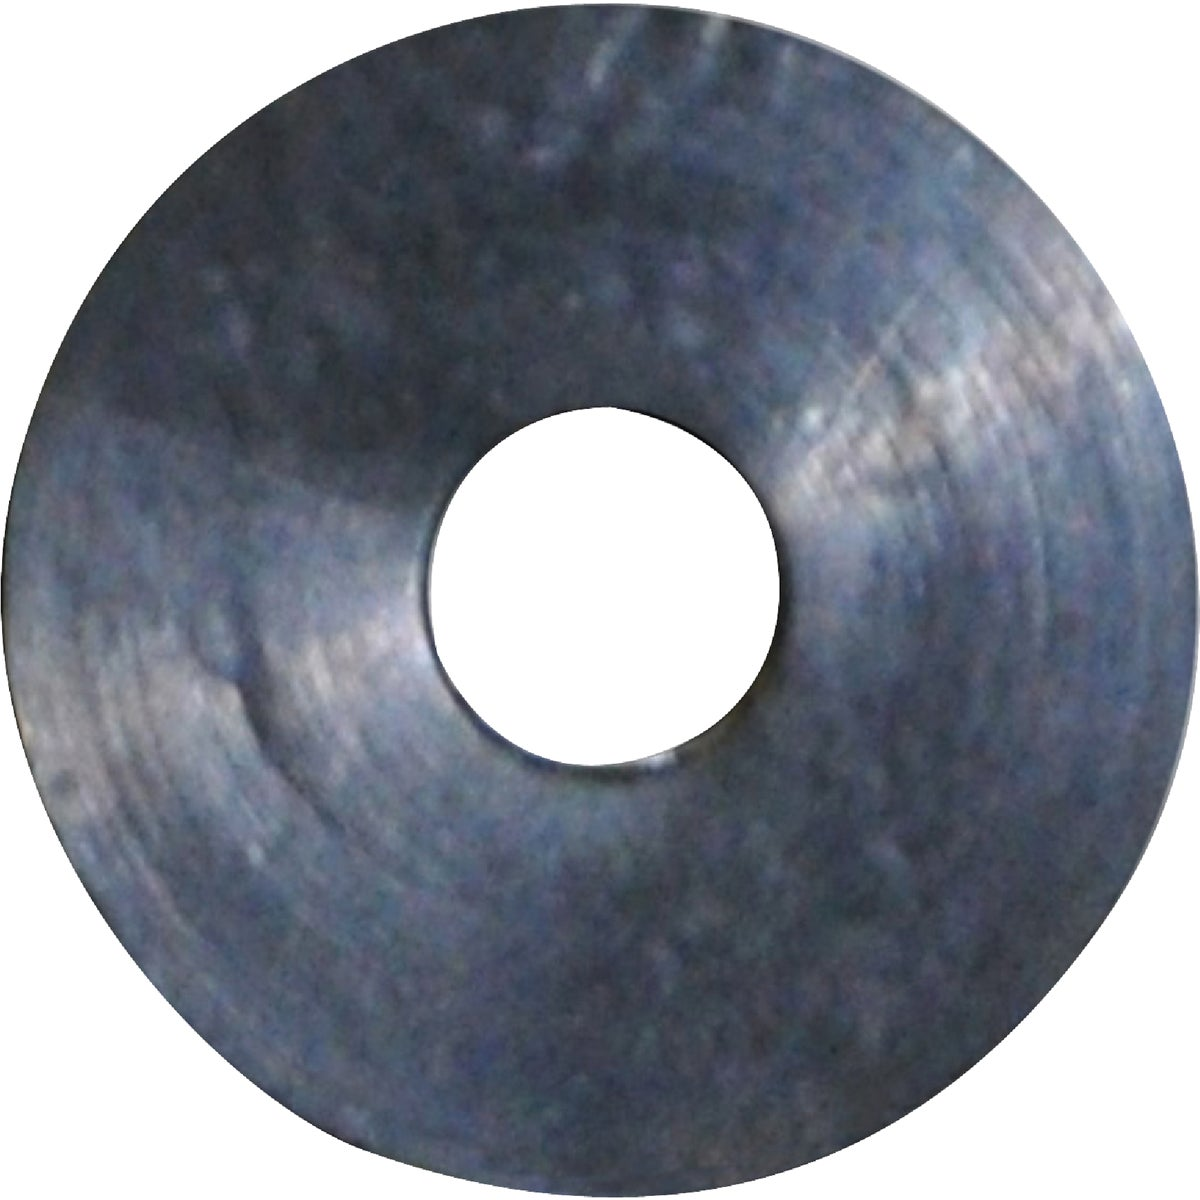 Danco 88576 Flat Washers, 10-Pack